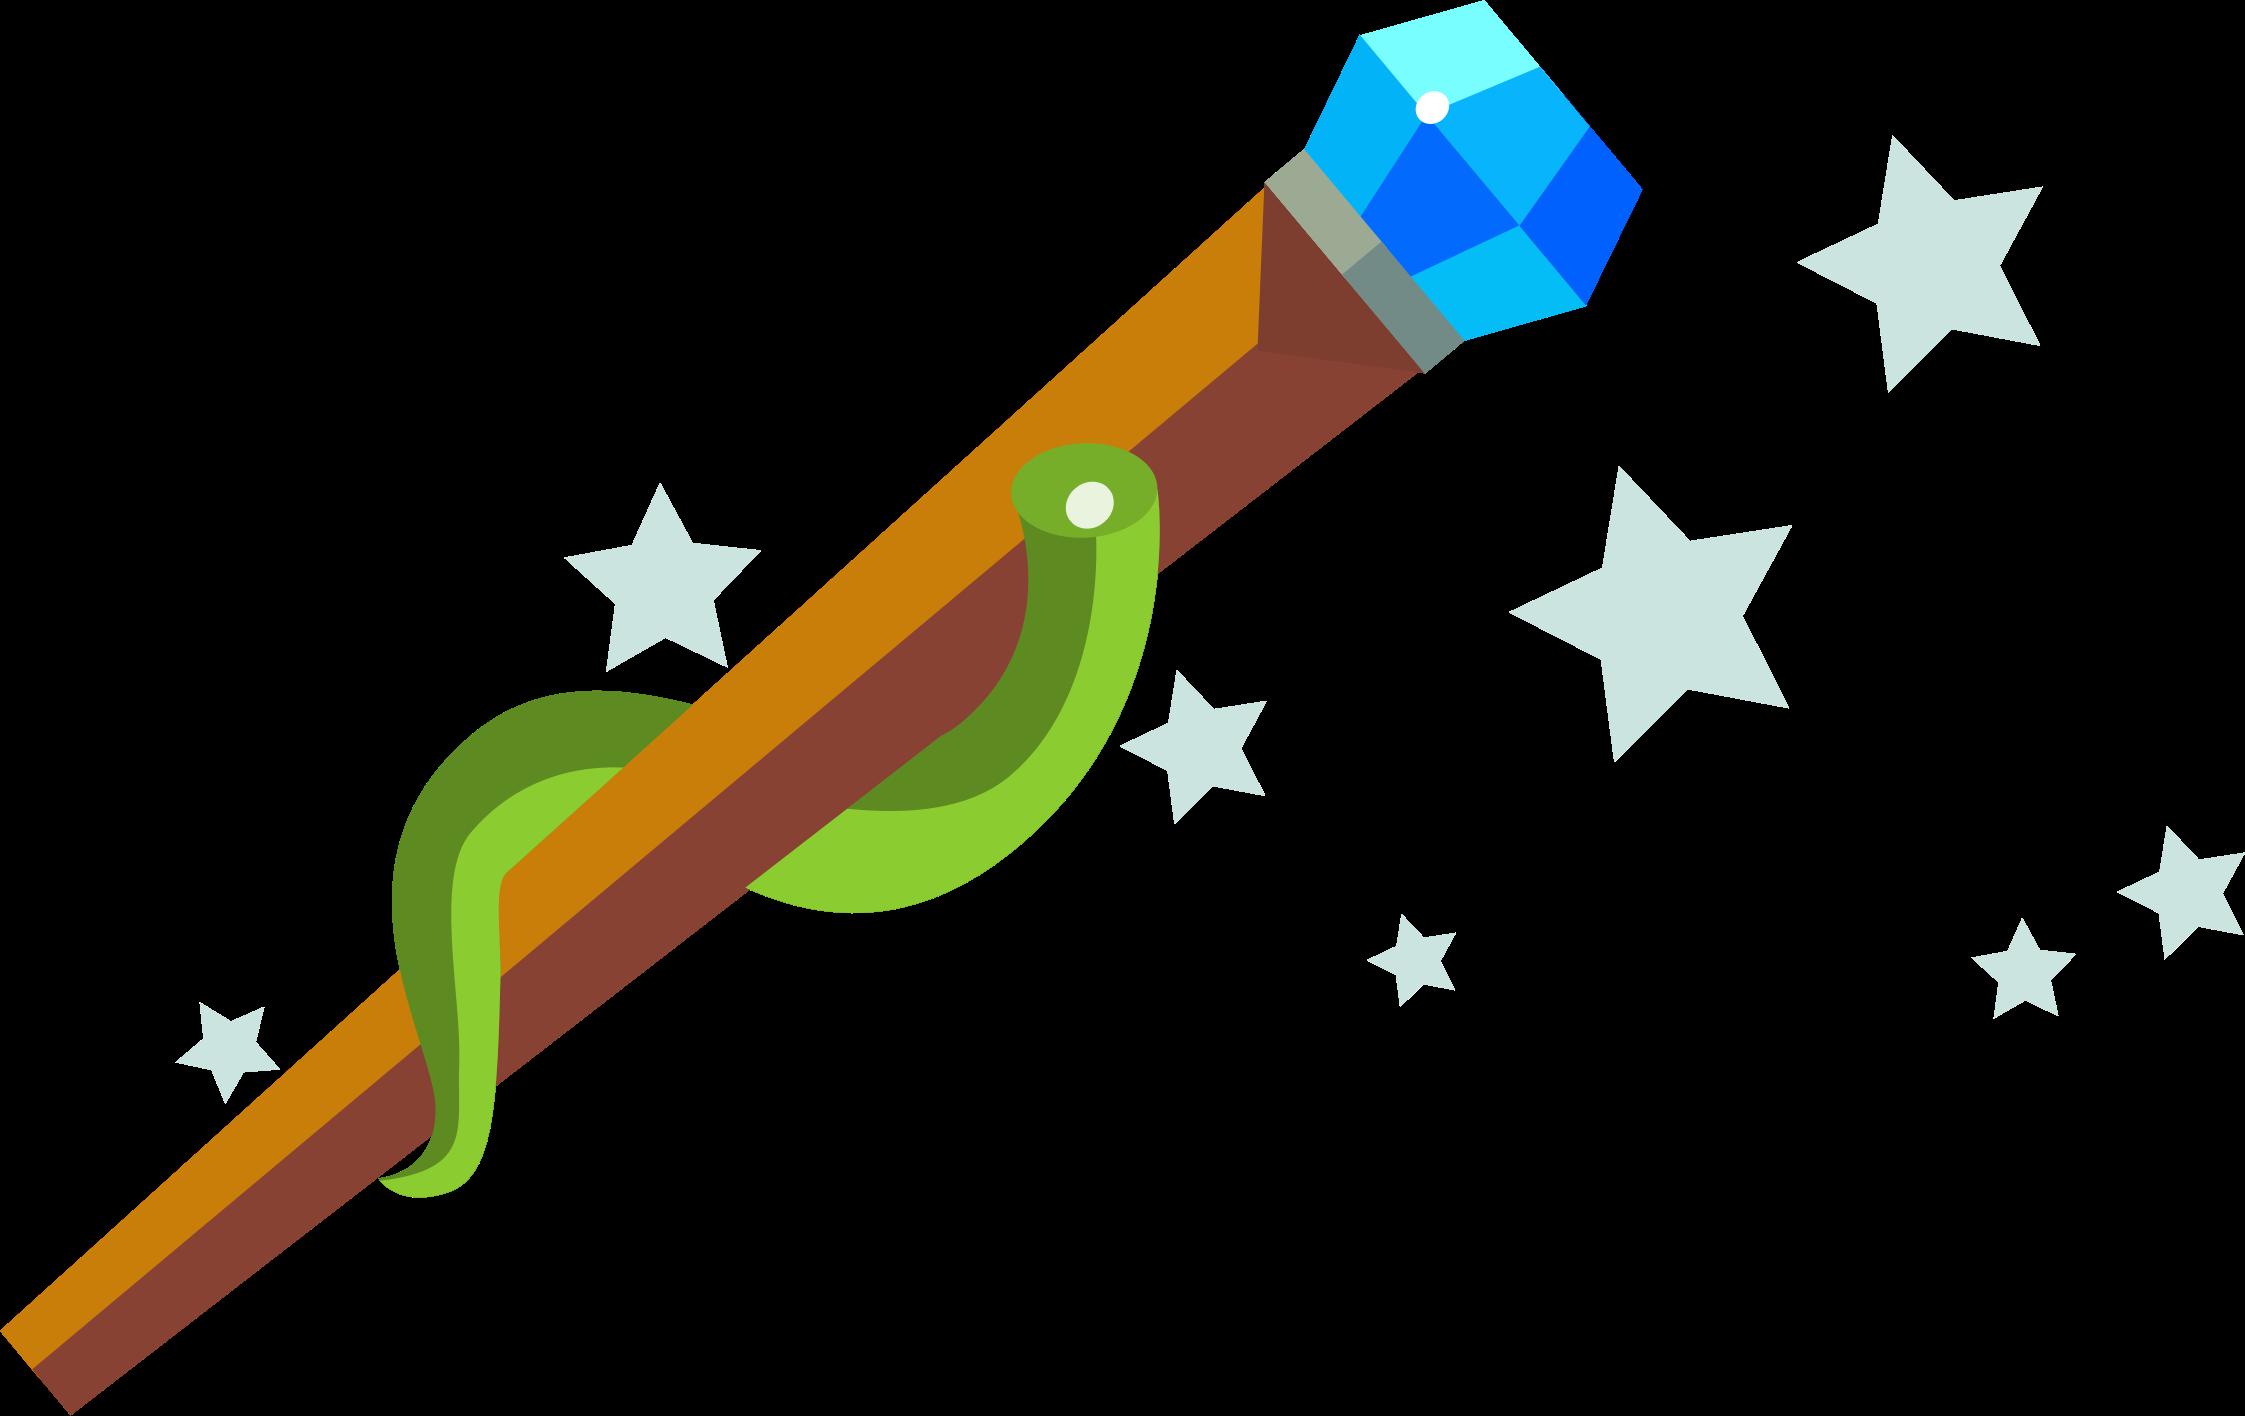 Magic clipart fairy wand. Png group zauberstab